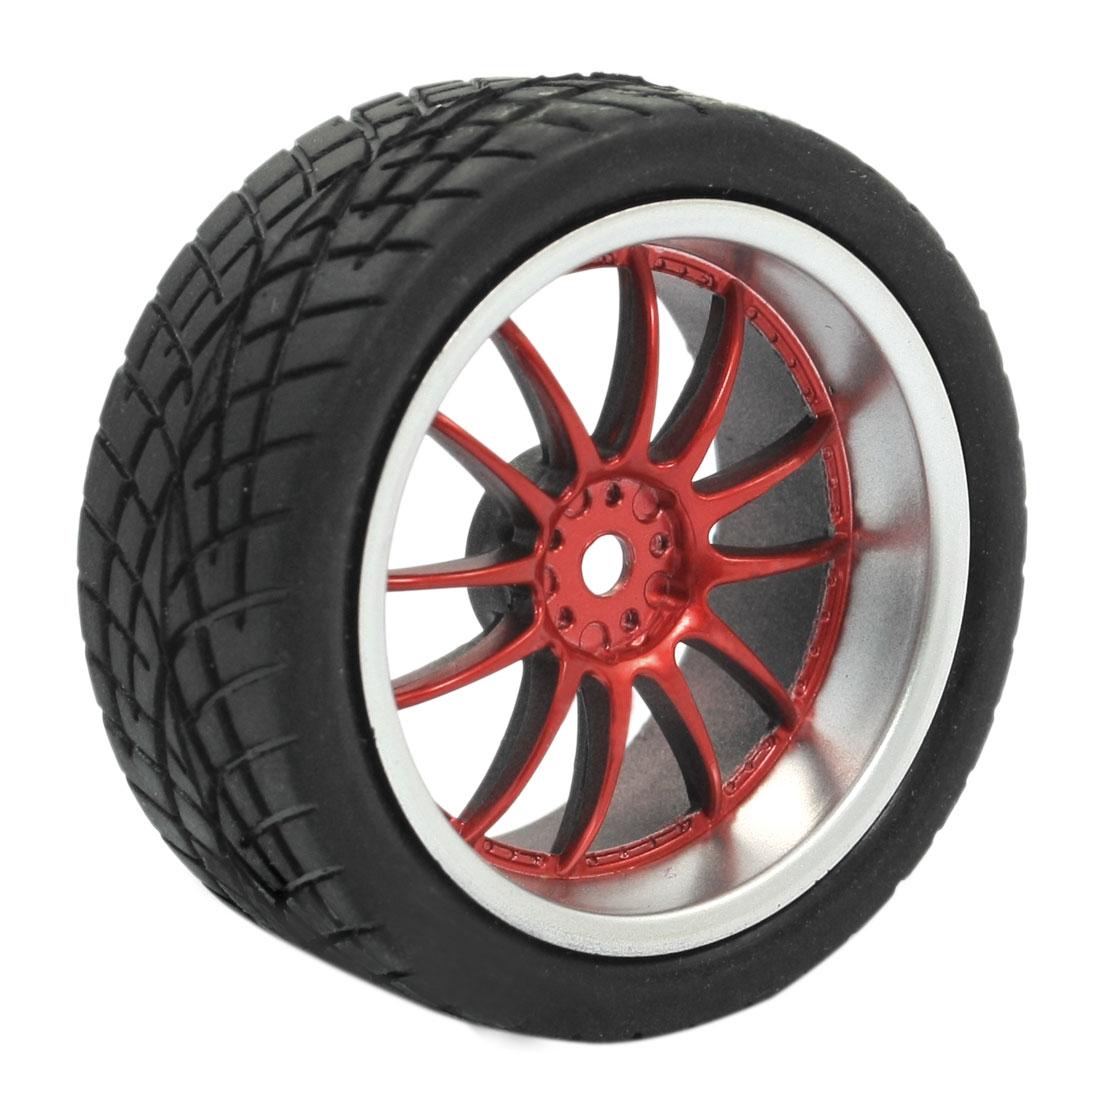 RC Model Smart Cars Off Road Red 10 Spoke 1:10 Plastic Tire Wheel